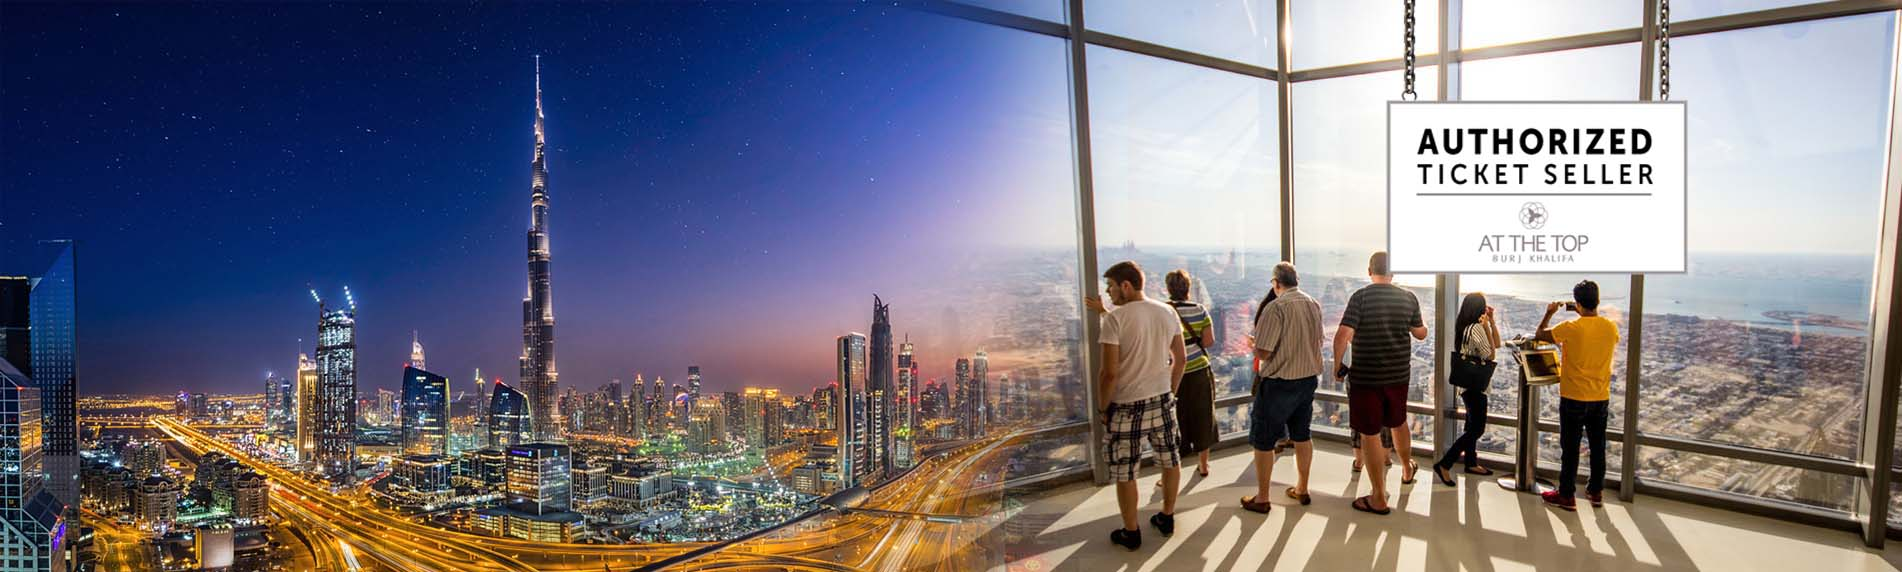 Burj Khalifa Tour From Fujairah With Transfer